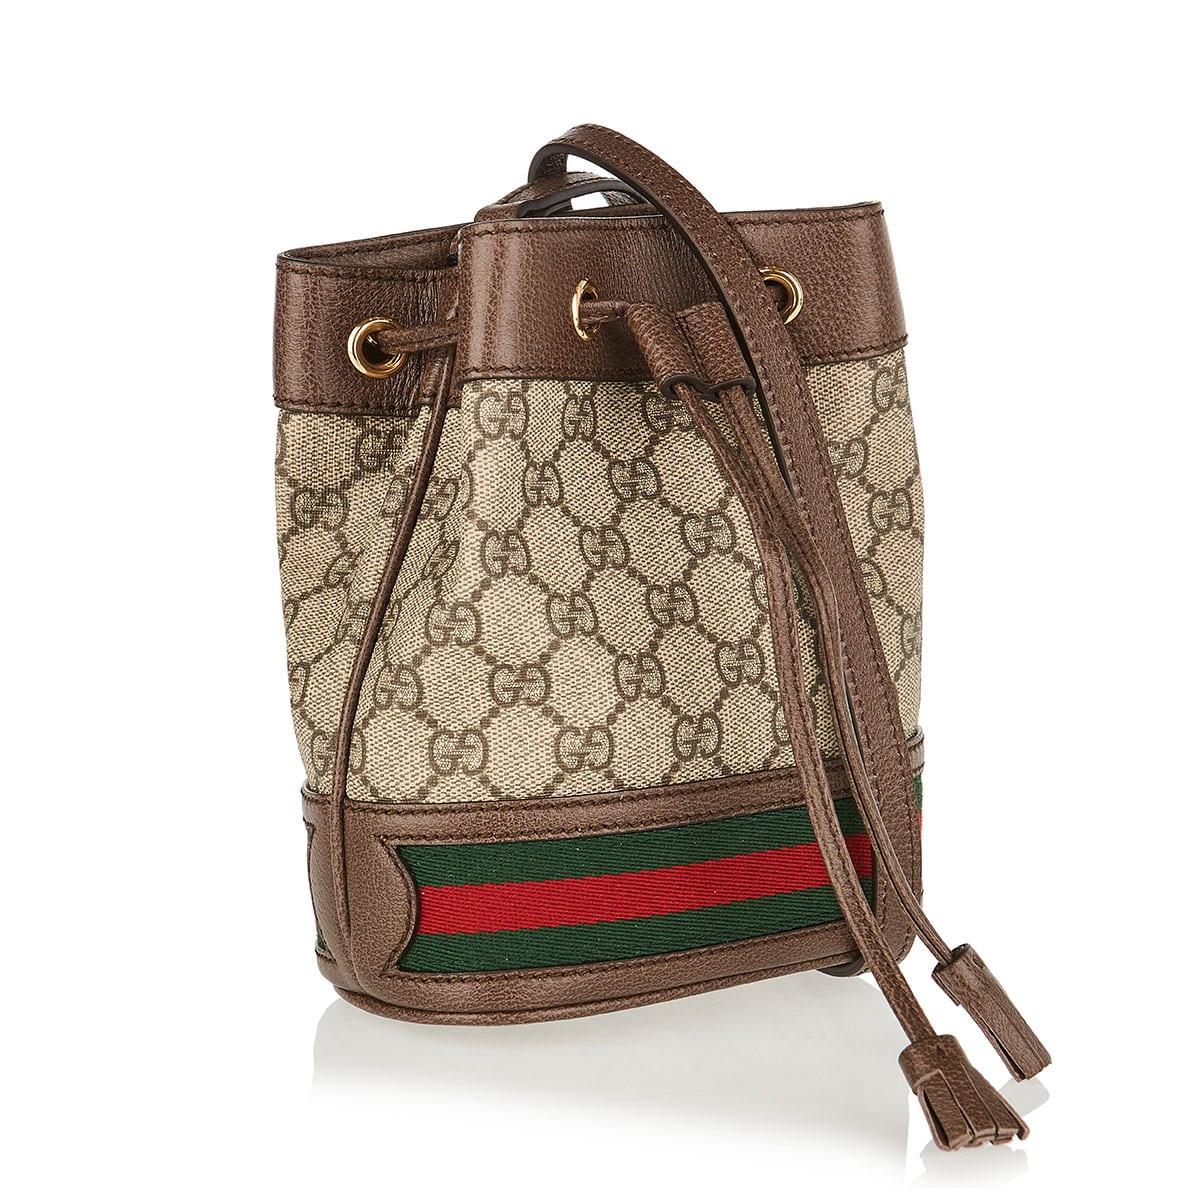 Ophidia GG mini bucket bag